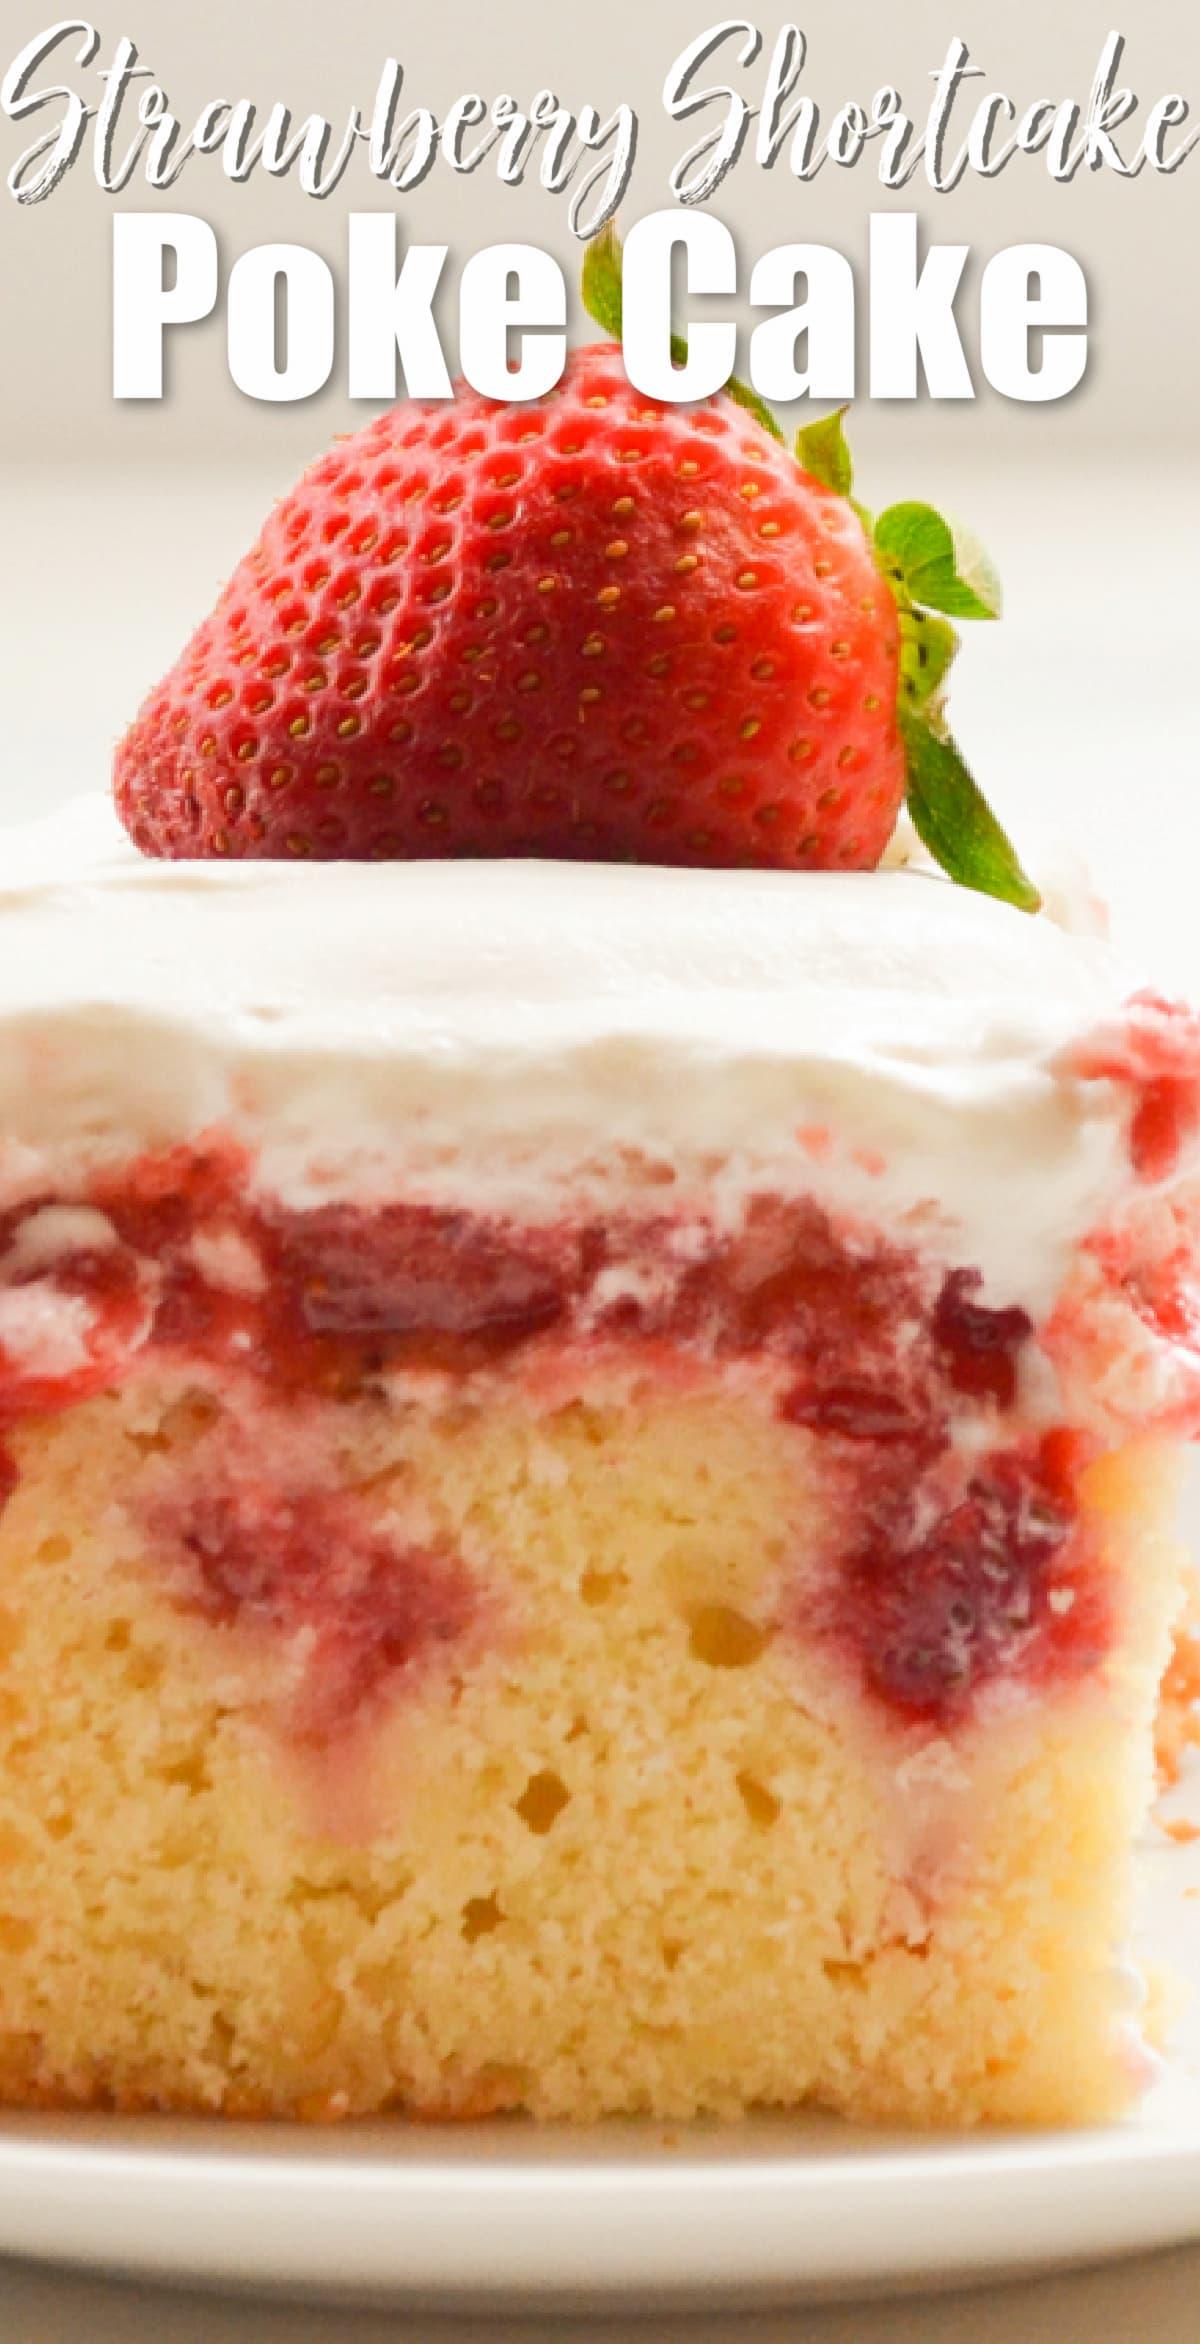 A slice of Strawberry Shortcake Poke Cake with white text at top Strawberry Shortcake Poke Cake.